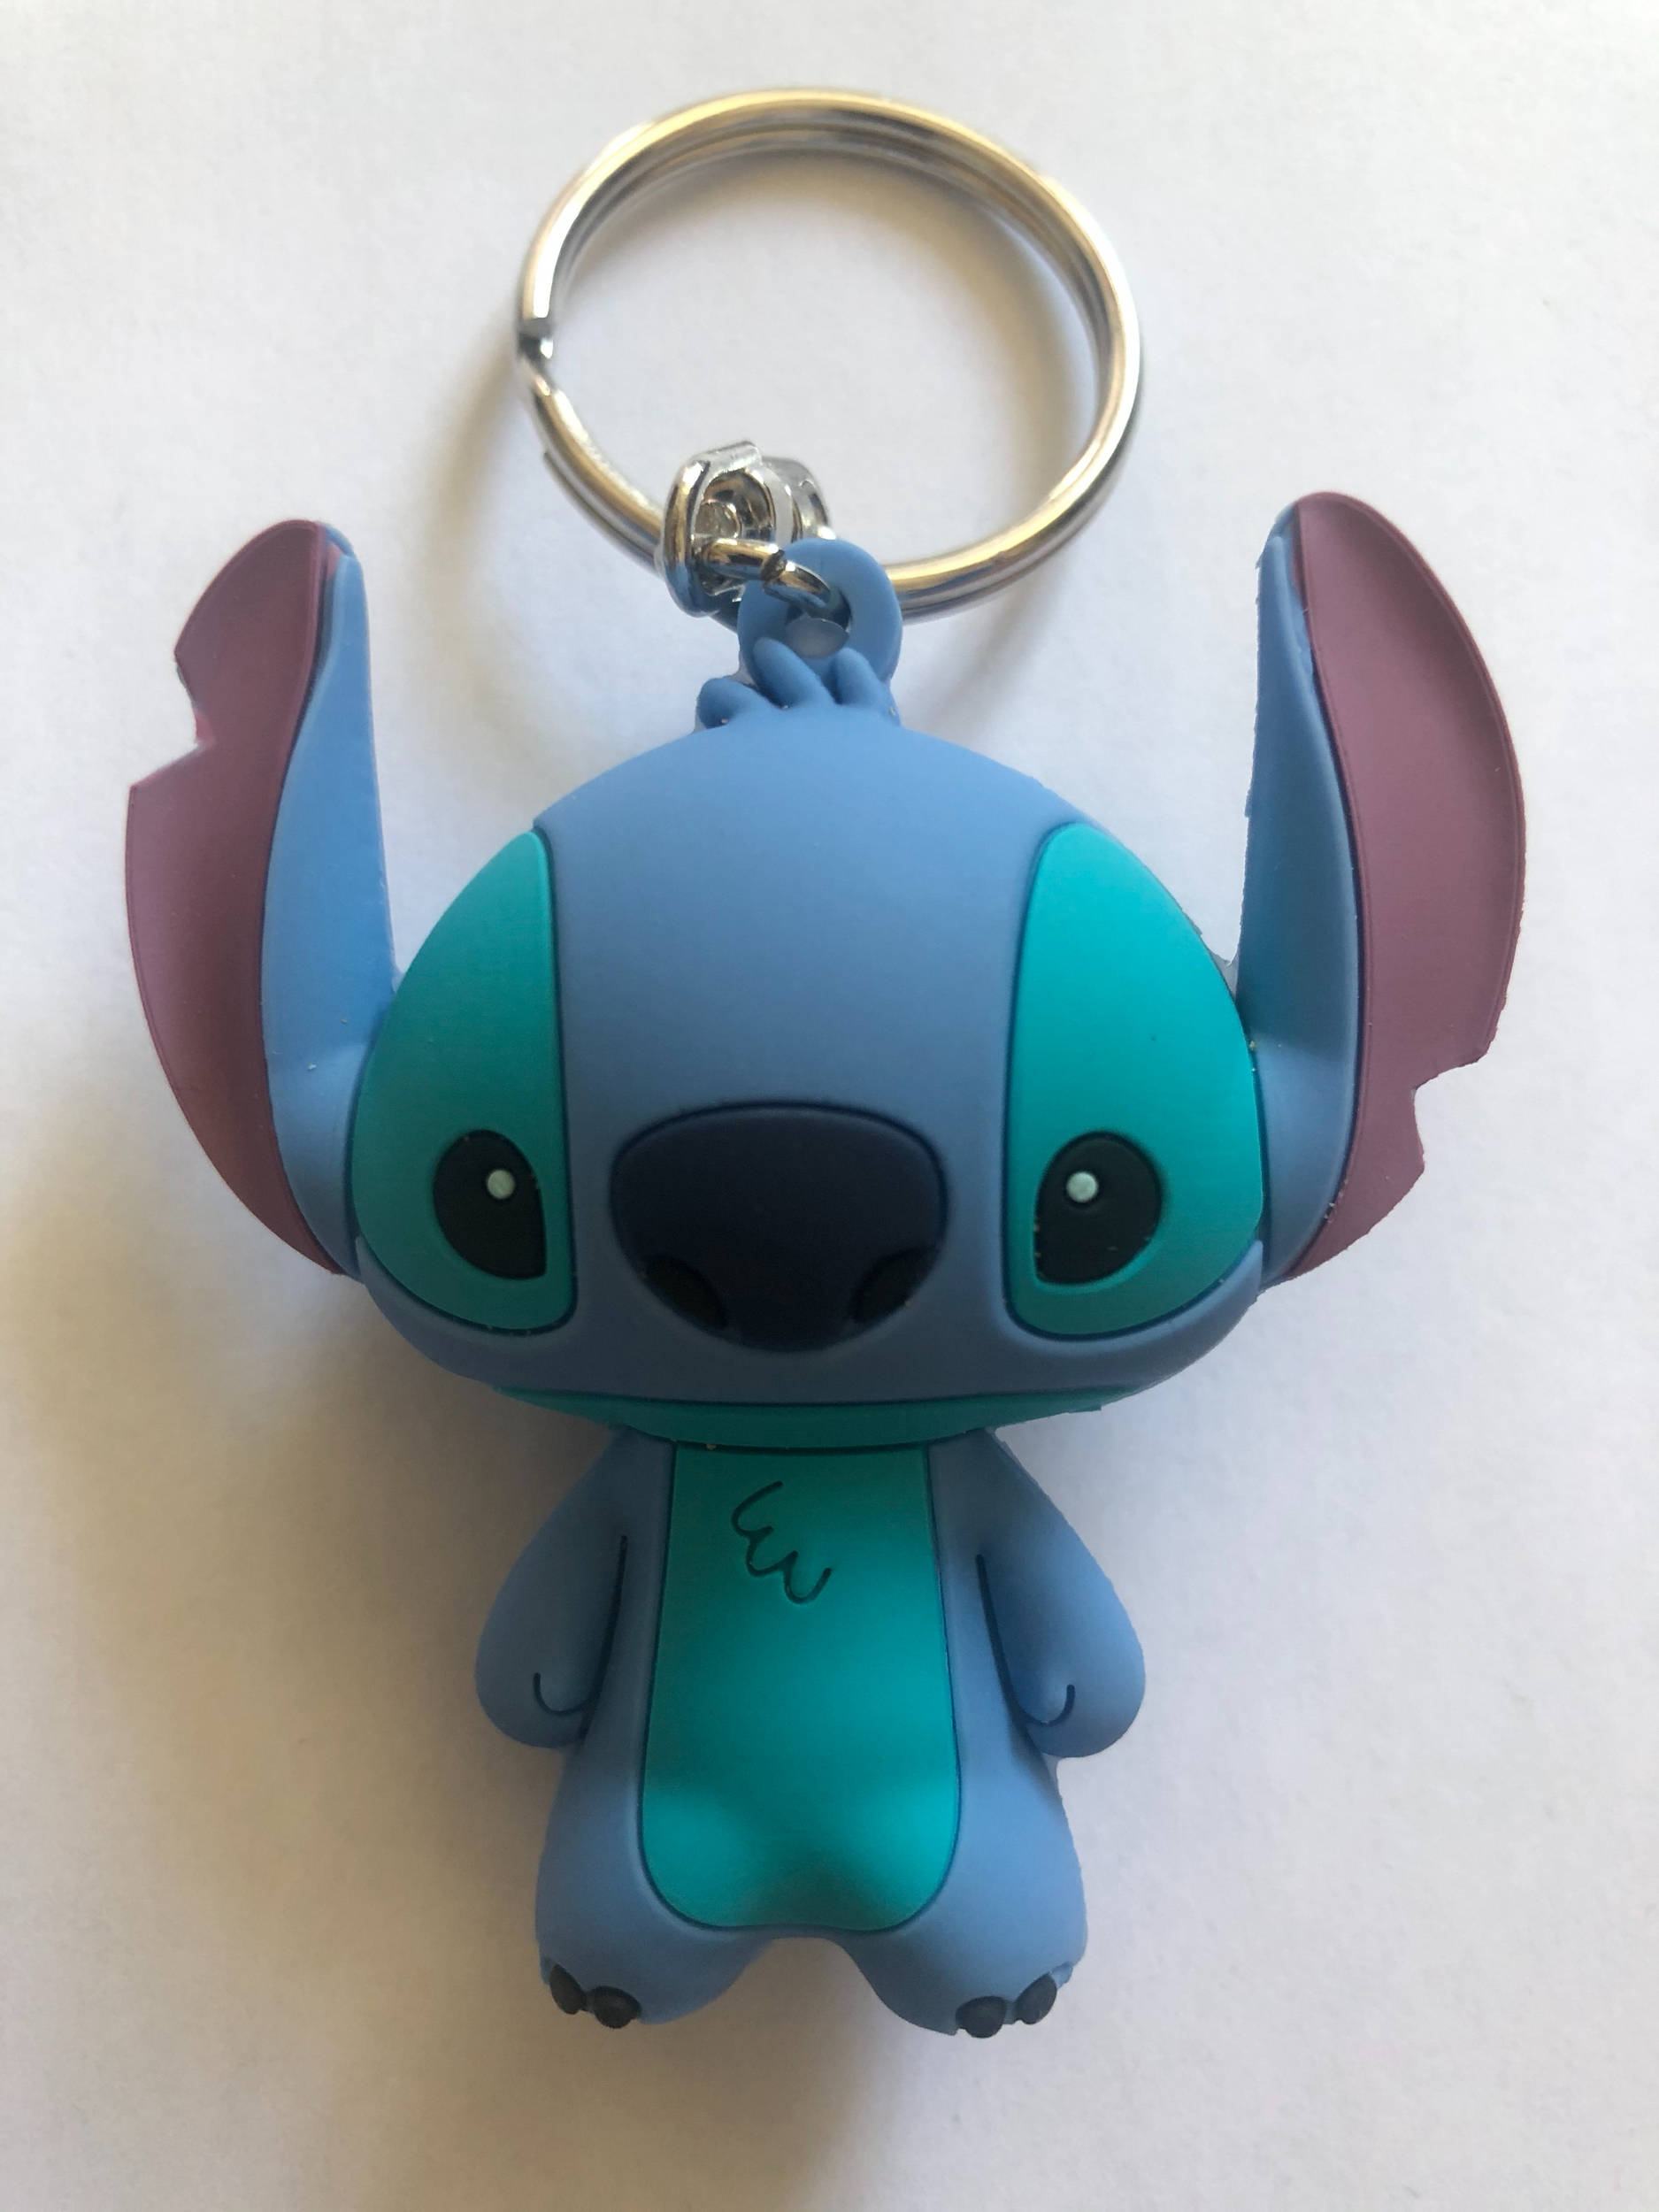 Dsney - Lilo et Stitch : Porte-clé Stitch SPVC